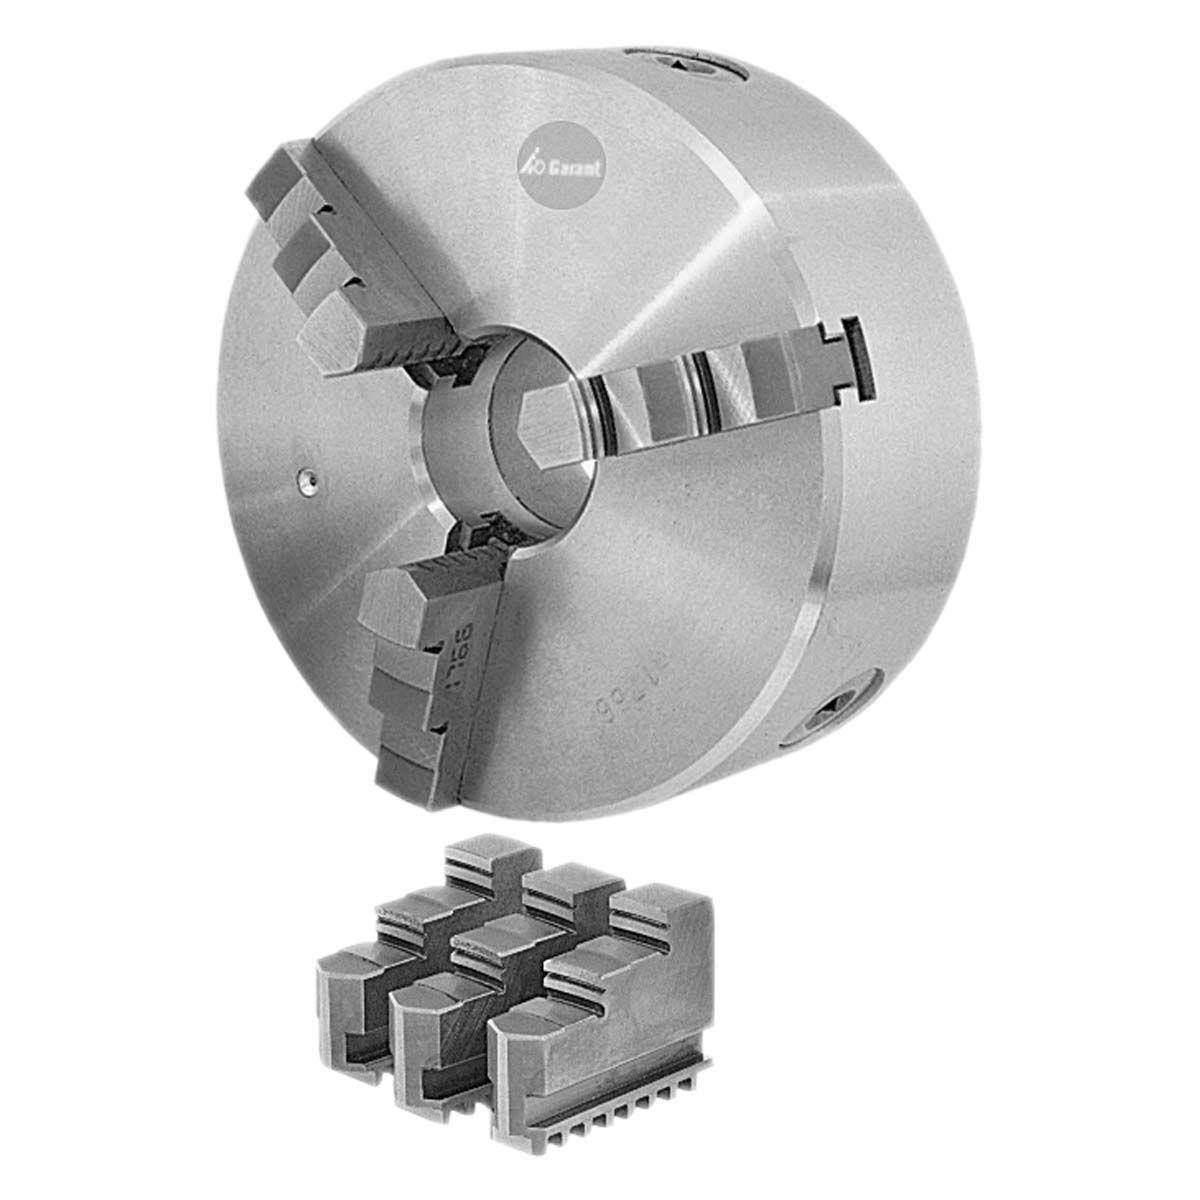 manual tightening turning chuck / 3-jaw / lathe / flange-mounted - 310600